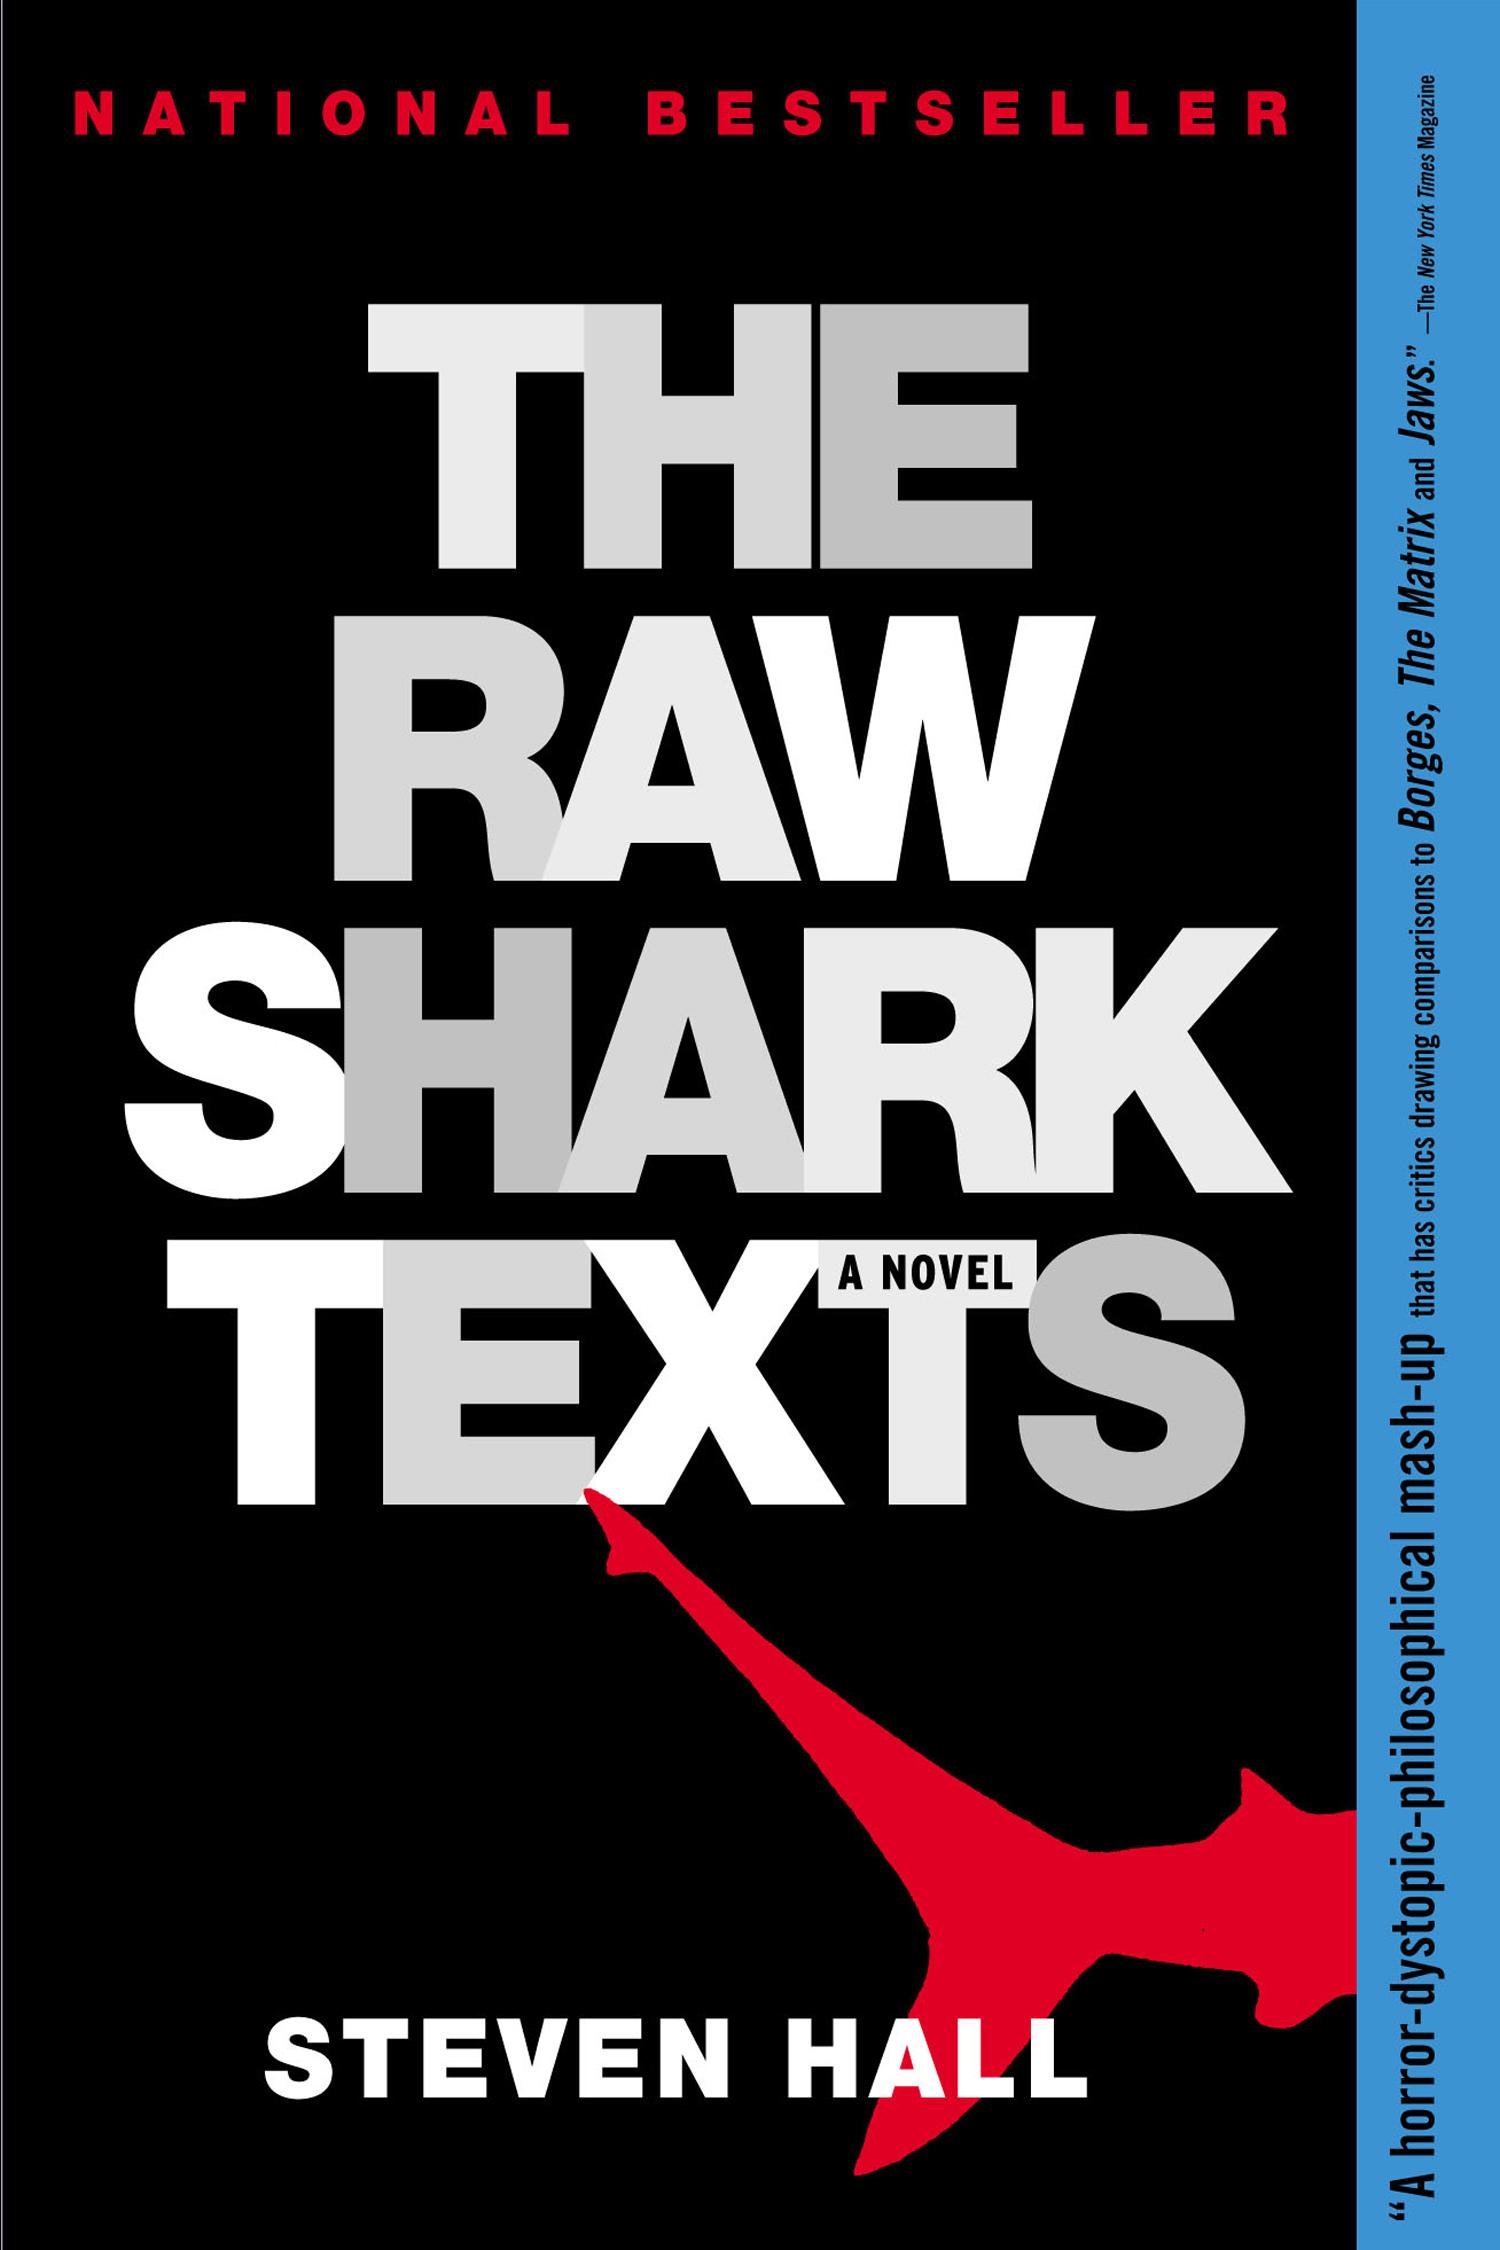 THE-RAW-SHARK-TEXTS-ss6.jpg